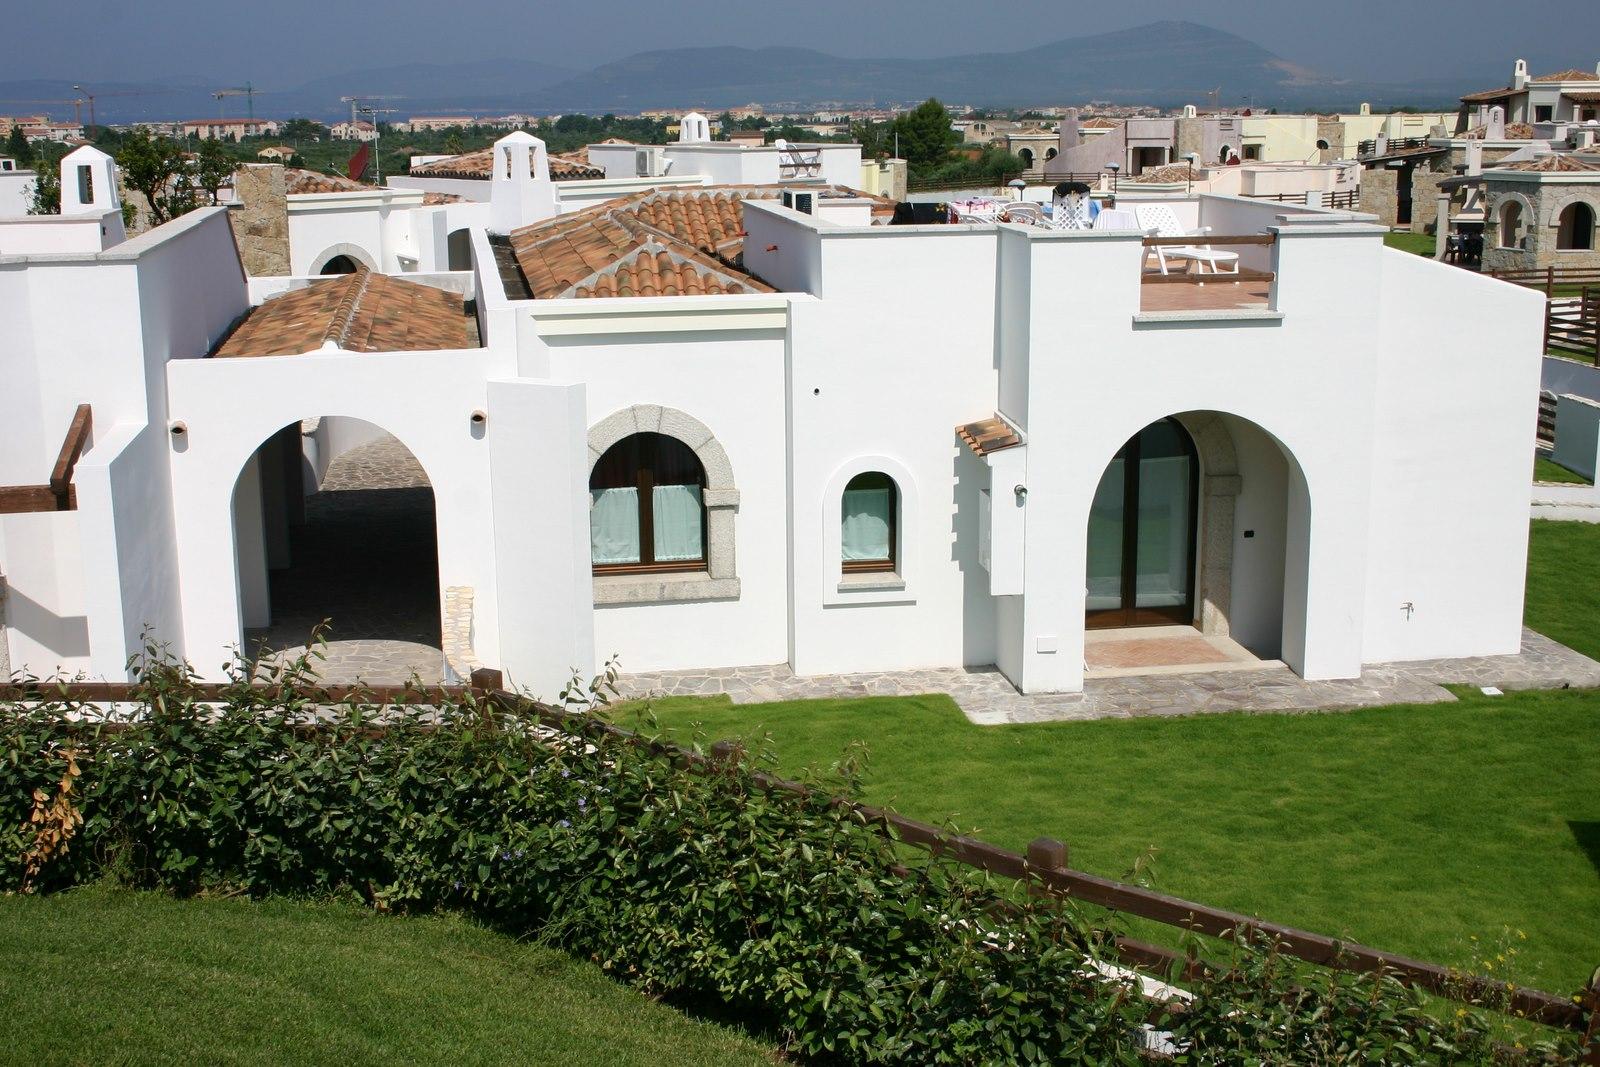 Ferienhaus Carru (877334), Sant Angelo Custode, Sassari, Sardinien, Italien, Bild 17